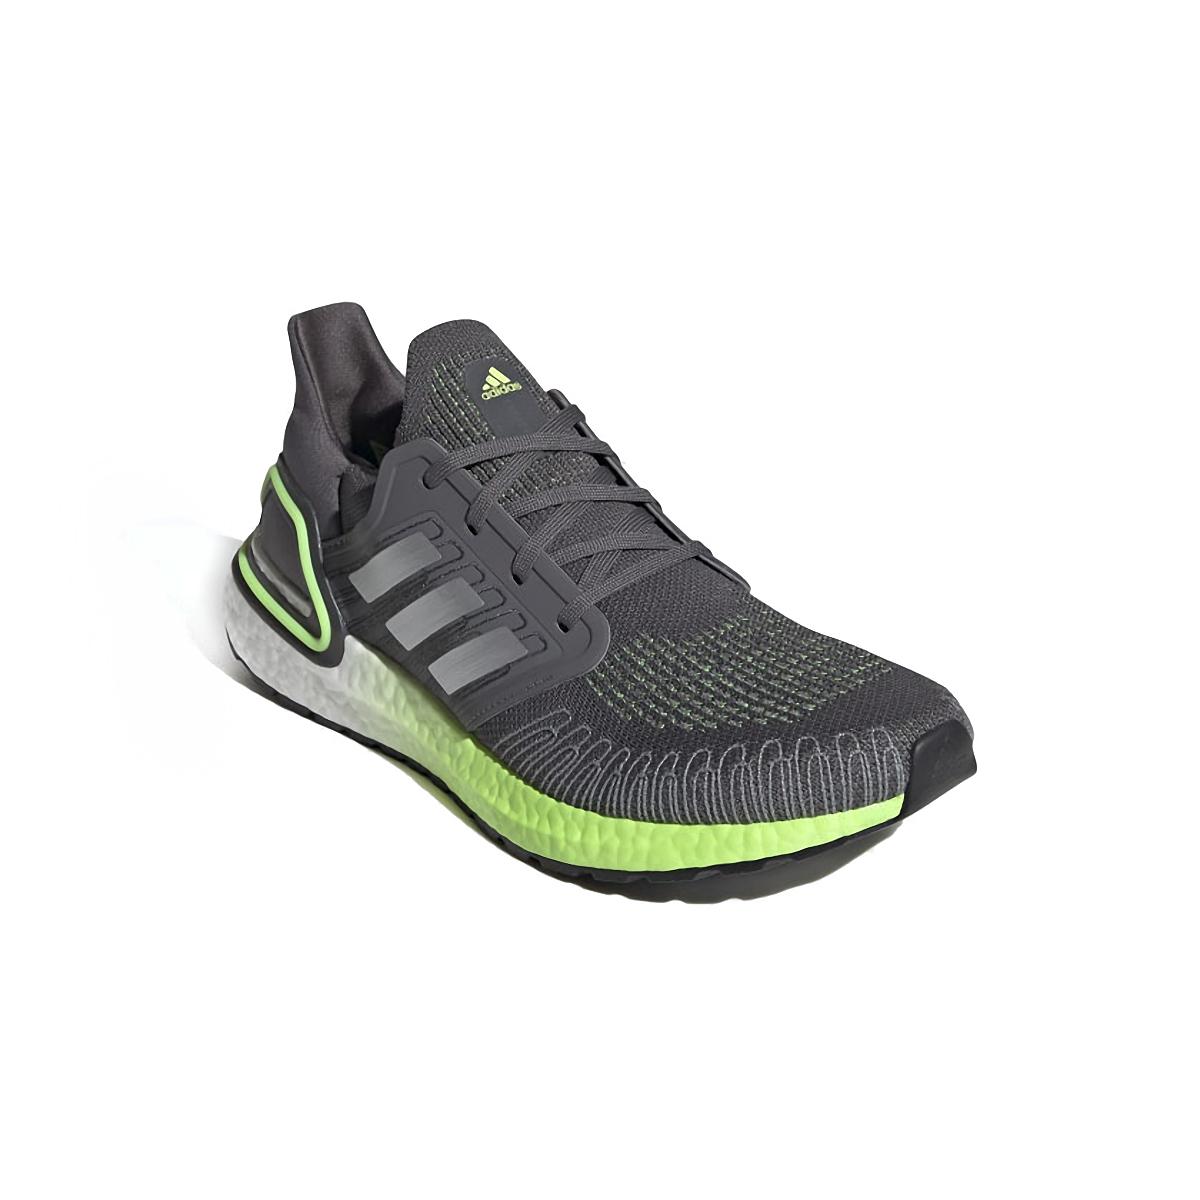 Men's Adidas Ultraboost 20 Running Shoe - Color: Grey/Silver Metallic/Signal Green  - Size: 6.5 - Width: Regular, Grey/Silver Metallic/Signal Green, large, image 4